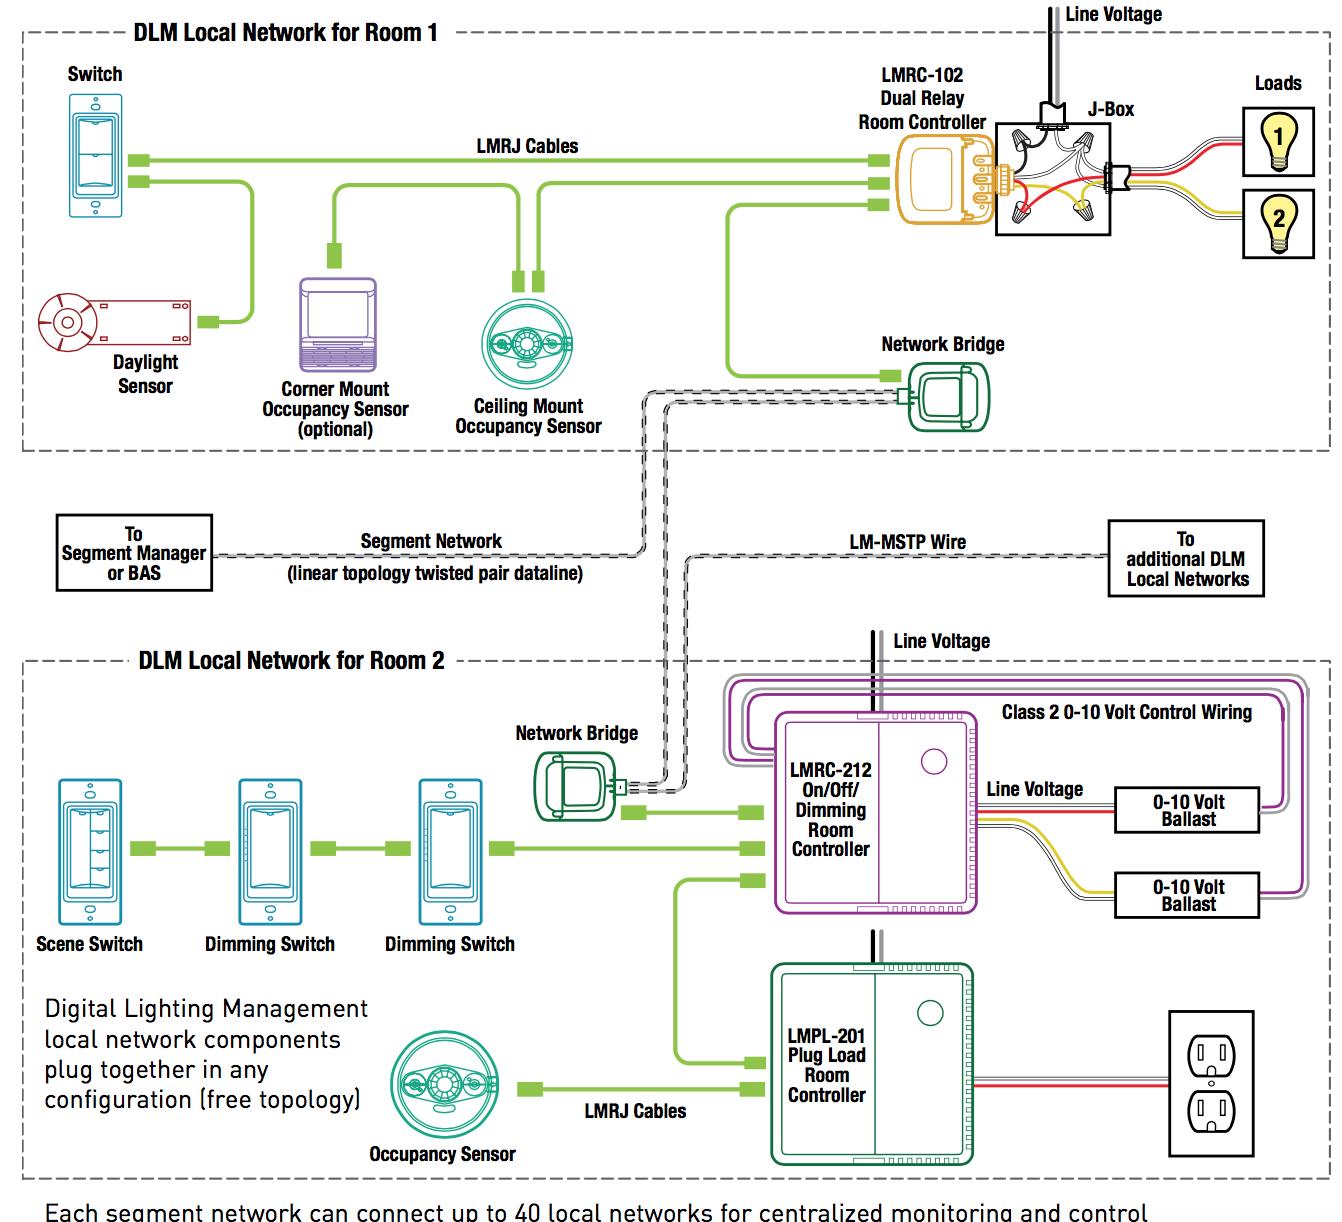 2015 Iecc Occupancy Sensor Wiring Diagram Schematics Diagrams Lutron Cooper Lighting Control Somurich Com Nlight Controls